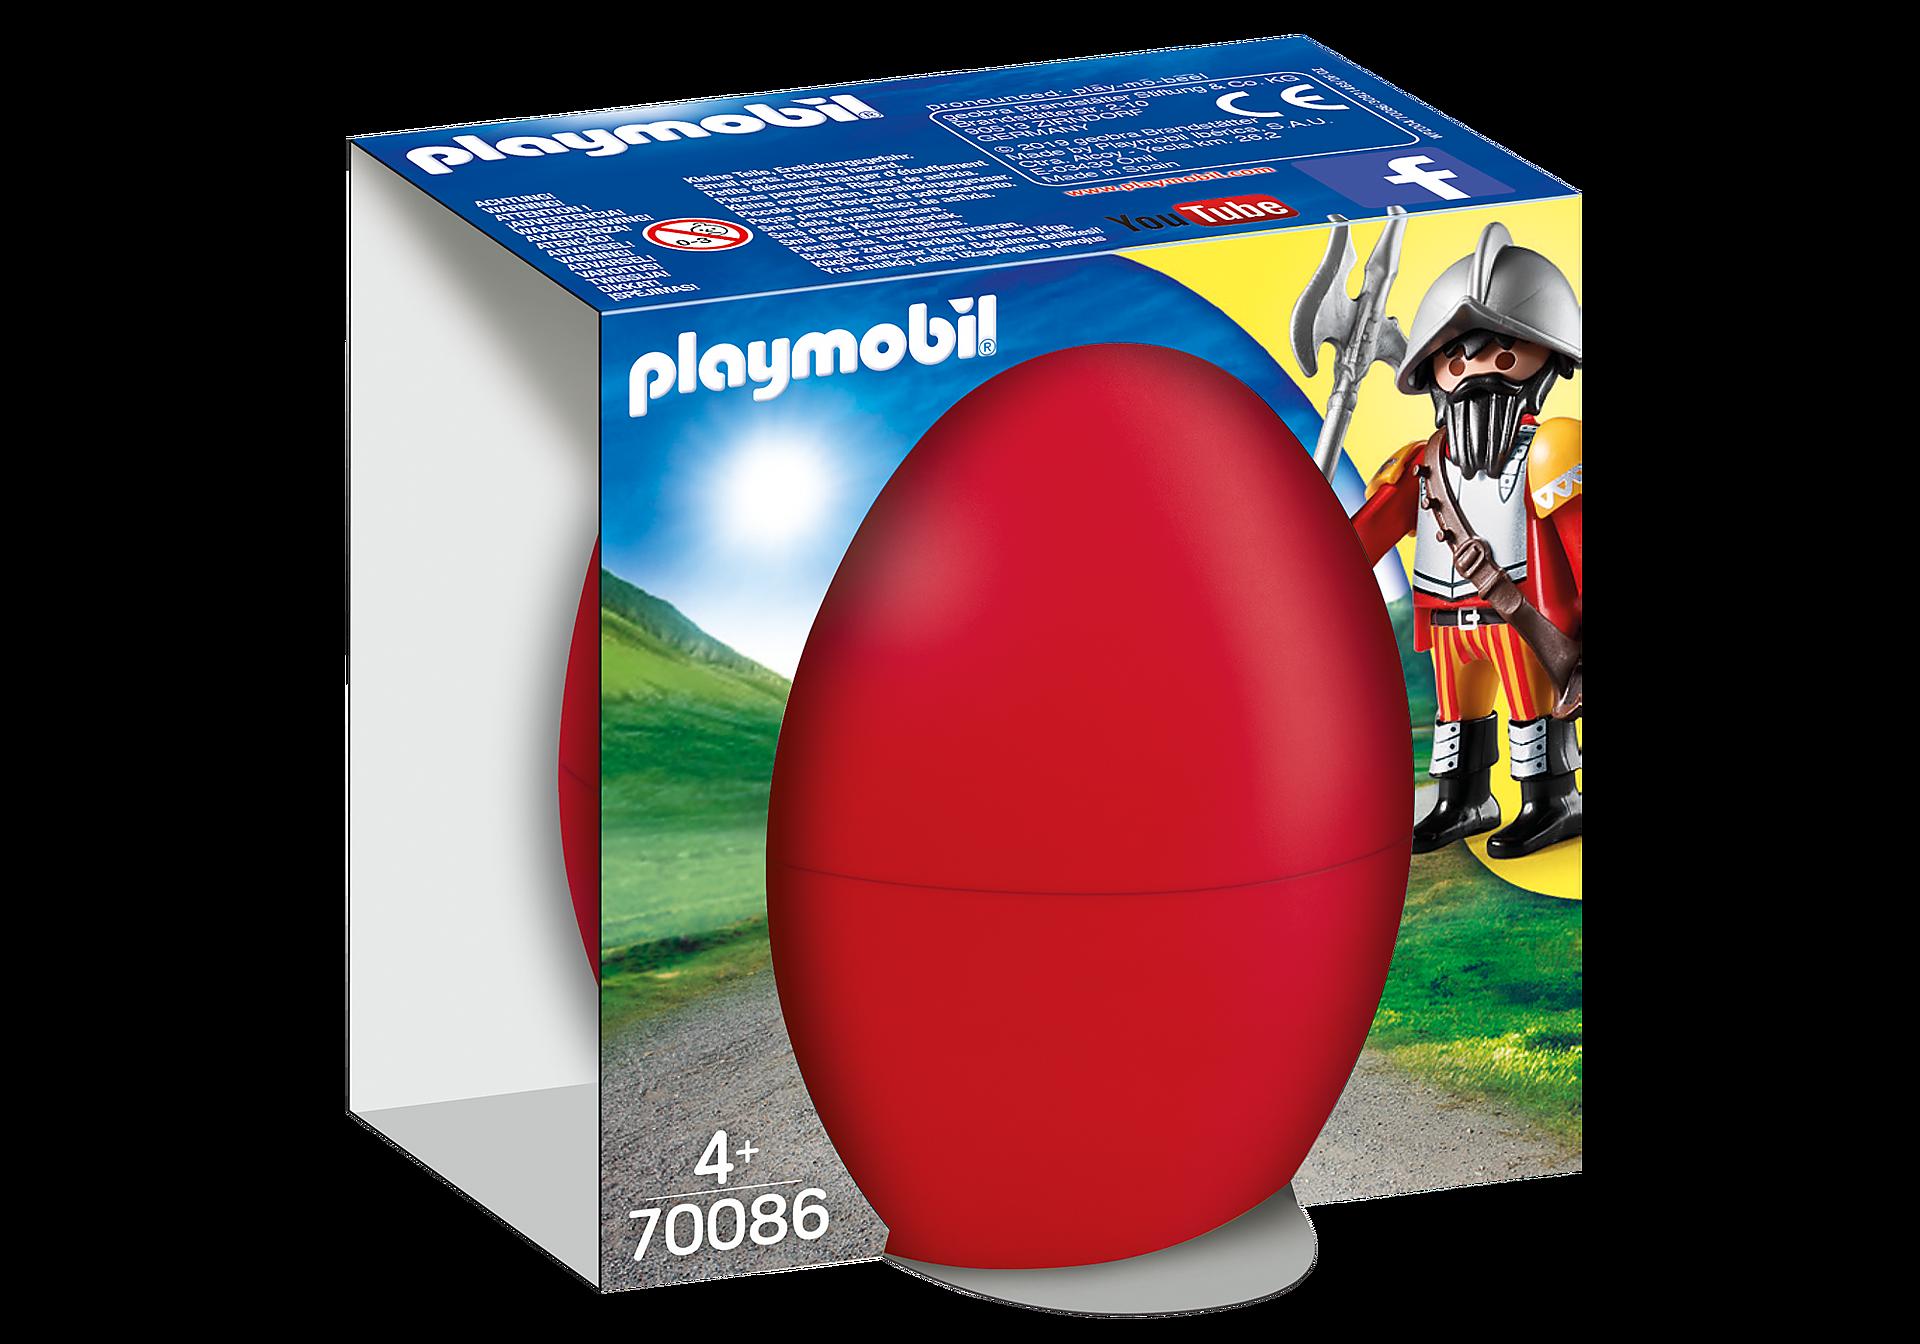 http://media.playmobil.com/i/playmobil/70086_product_box_front/Riddare med kanon